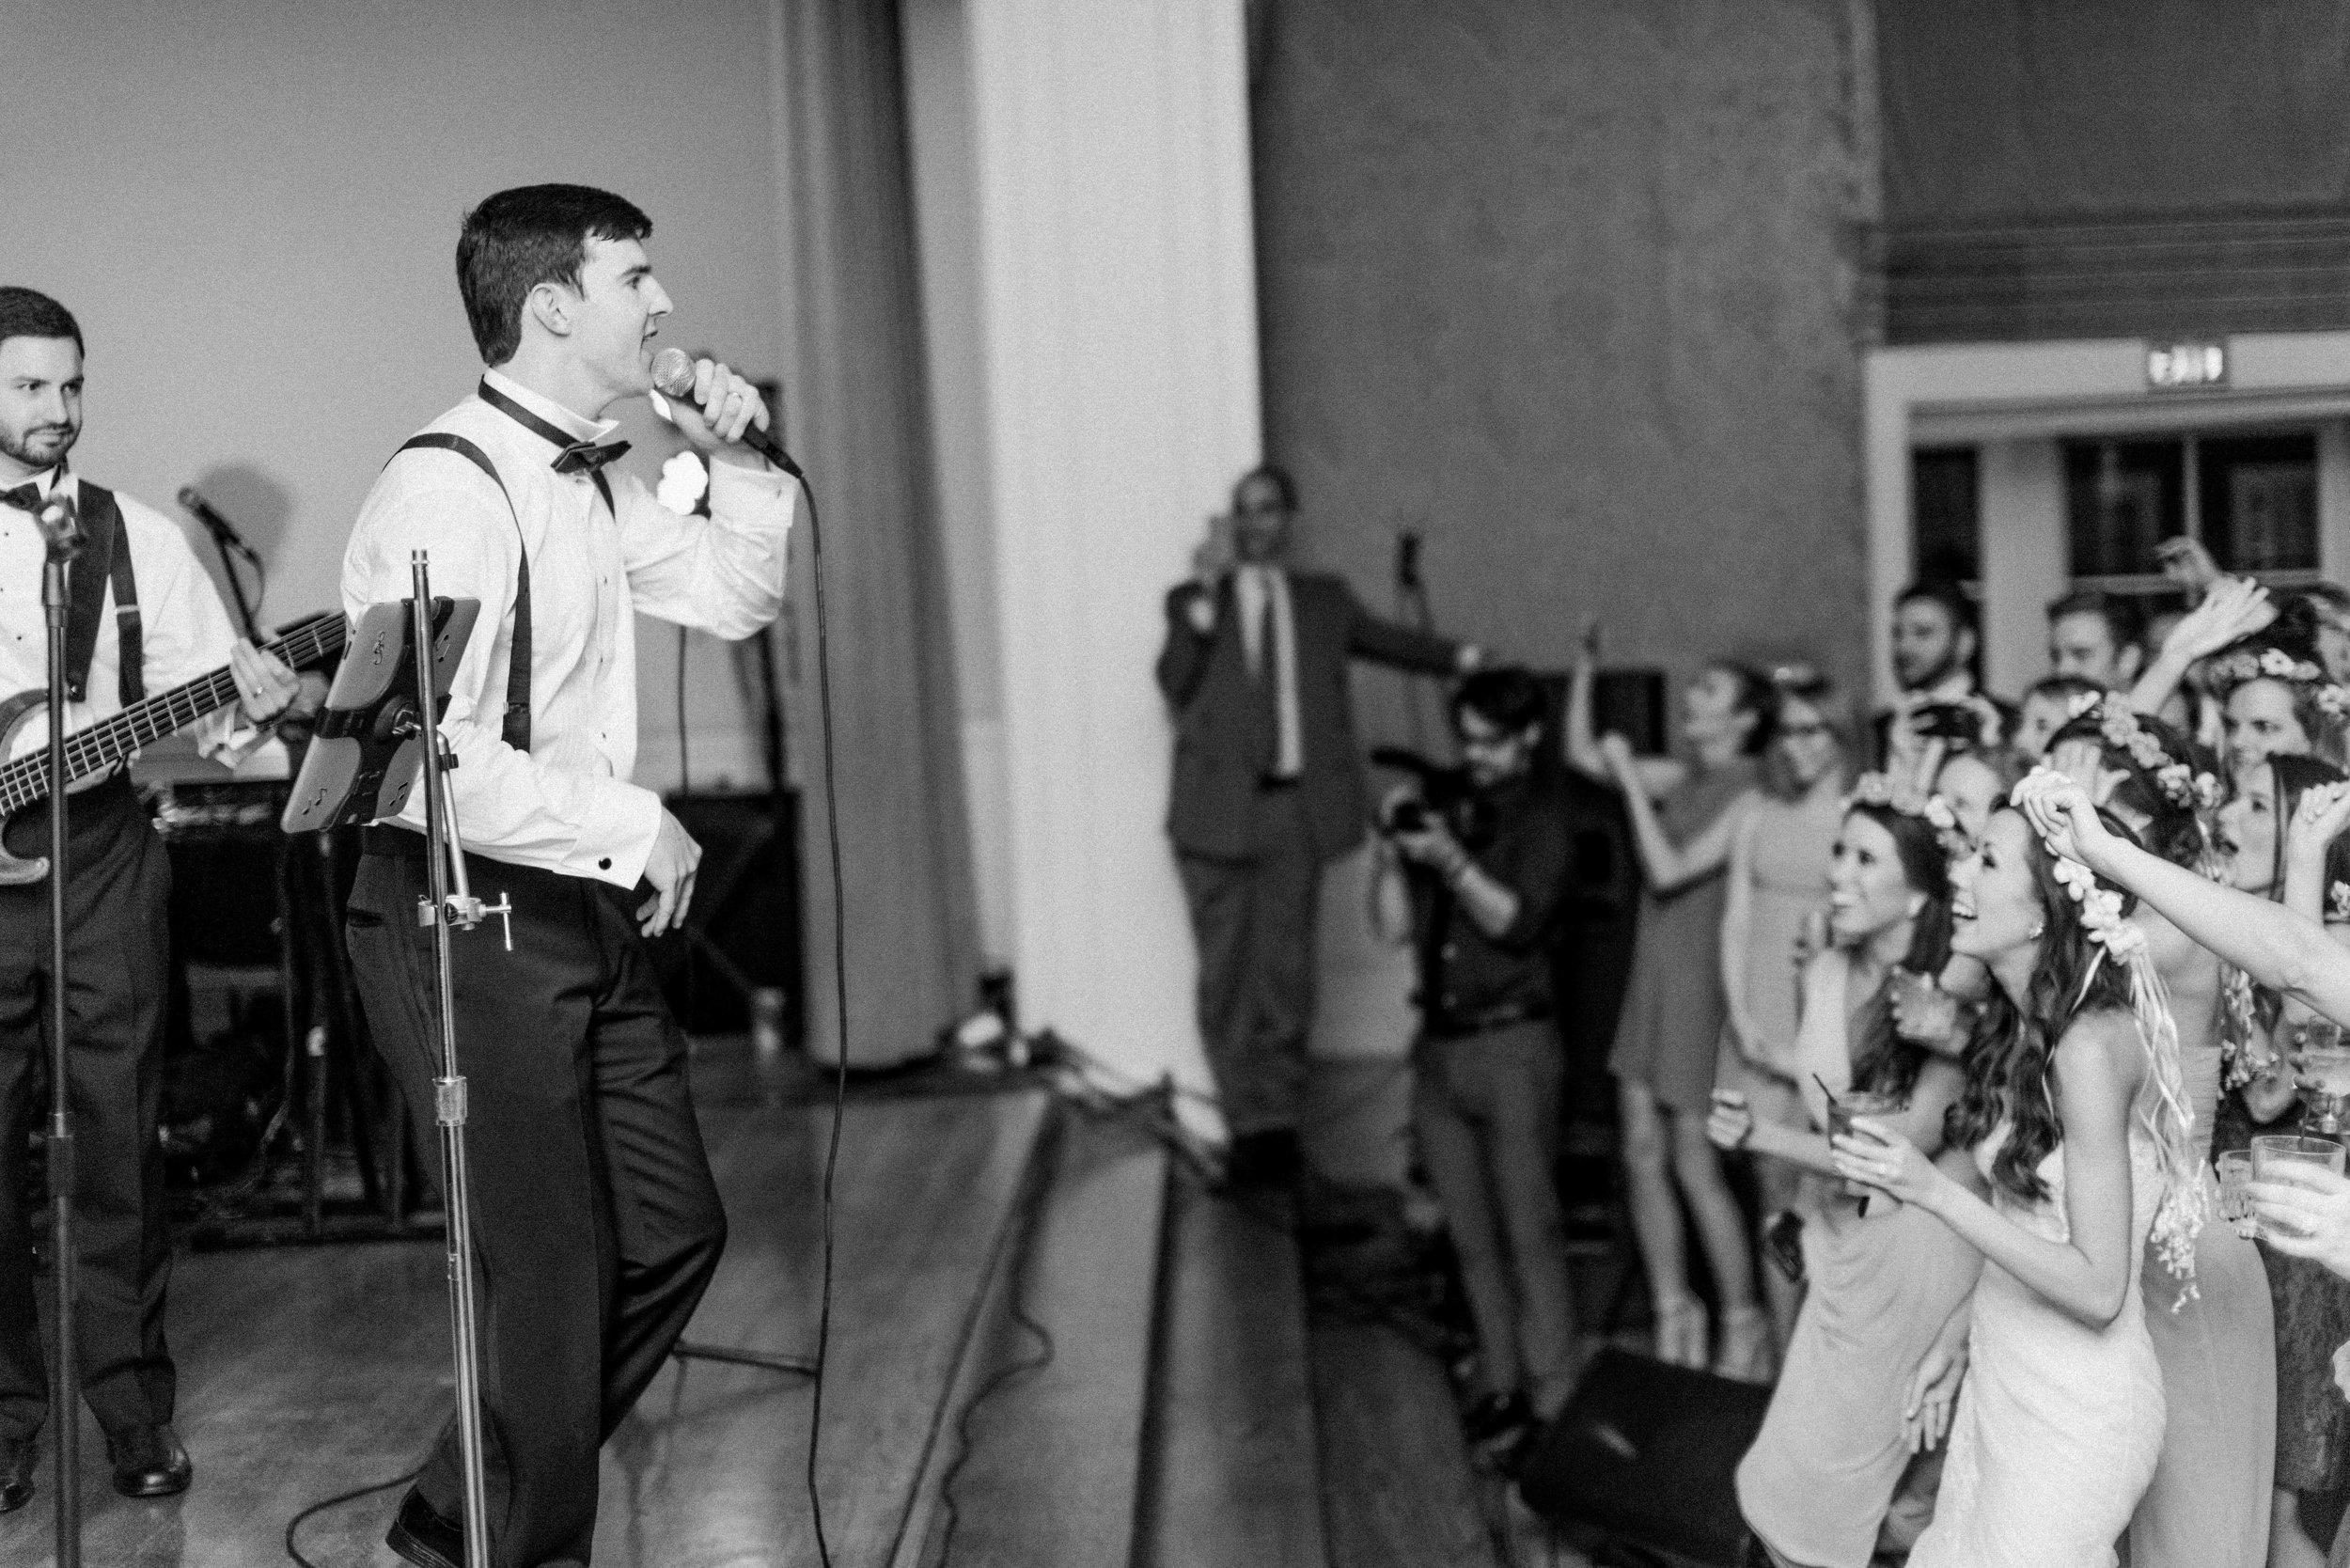 St.-Philip-Presbyterian-Church-Houston-Wedding-Ceremony-The-Junior-League-Of-Houston-Reception-Dana-Fernandez-Photography-Fine-Art-Film-34.jpg